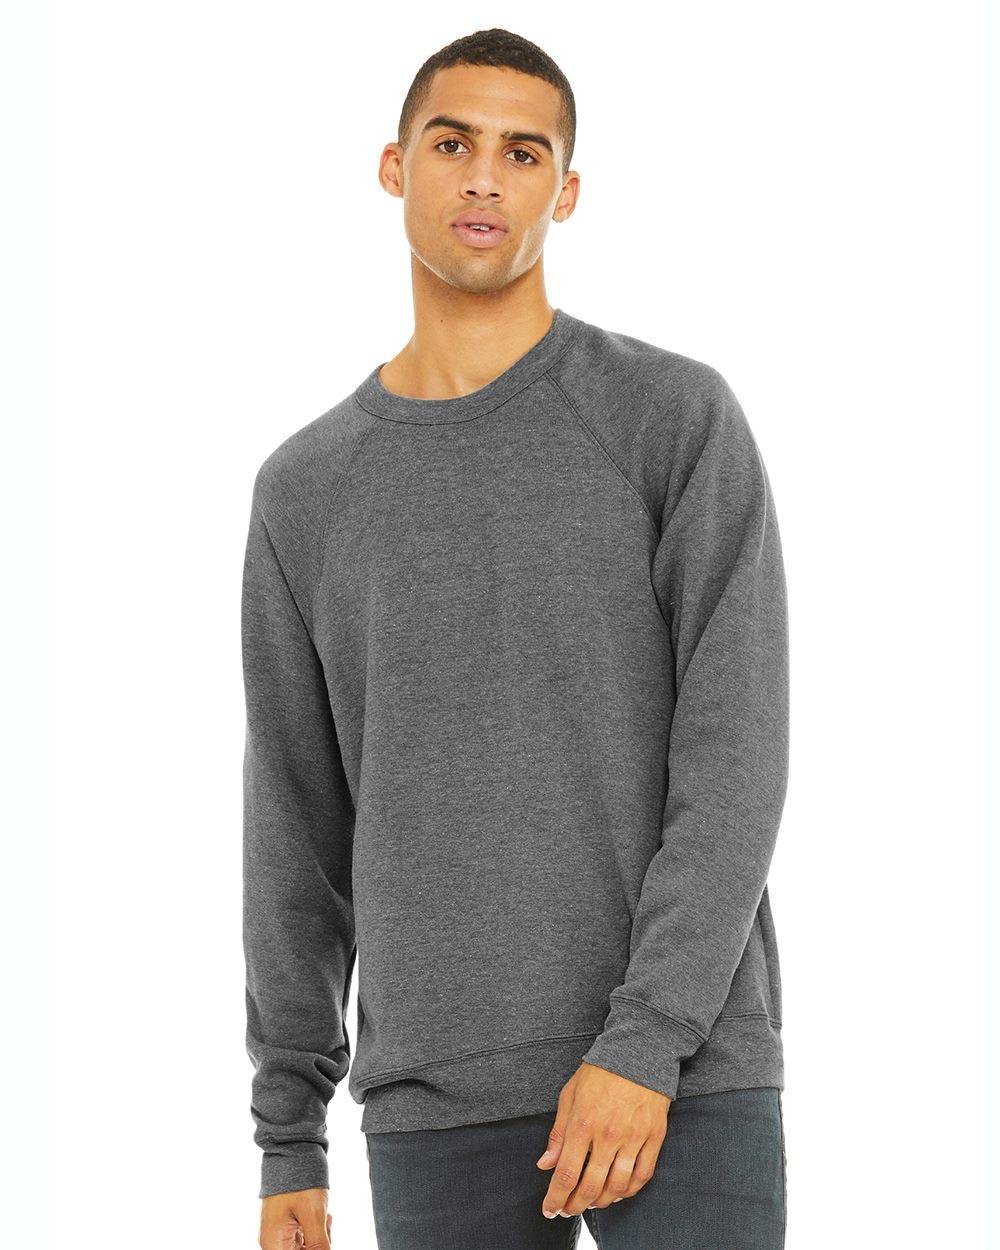 Bella + Canvas 3901 - Unisex Sponge Fleece Raglan Sweatshirt